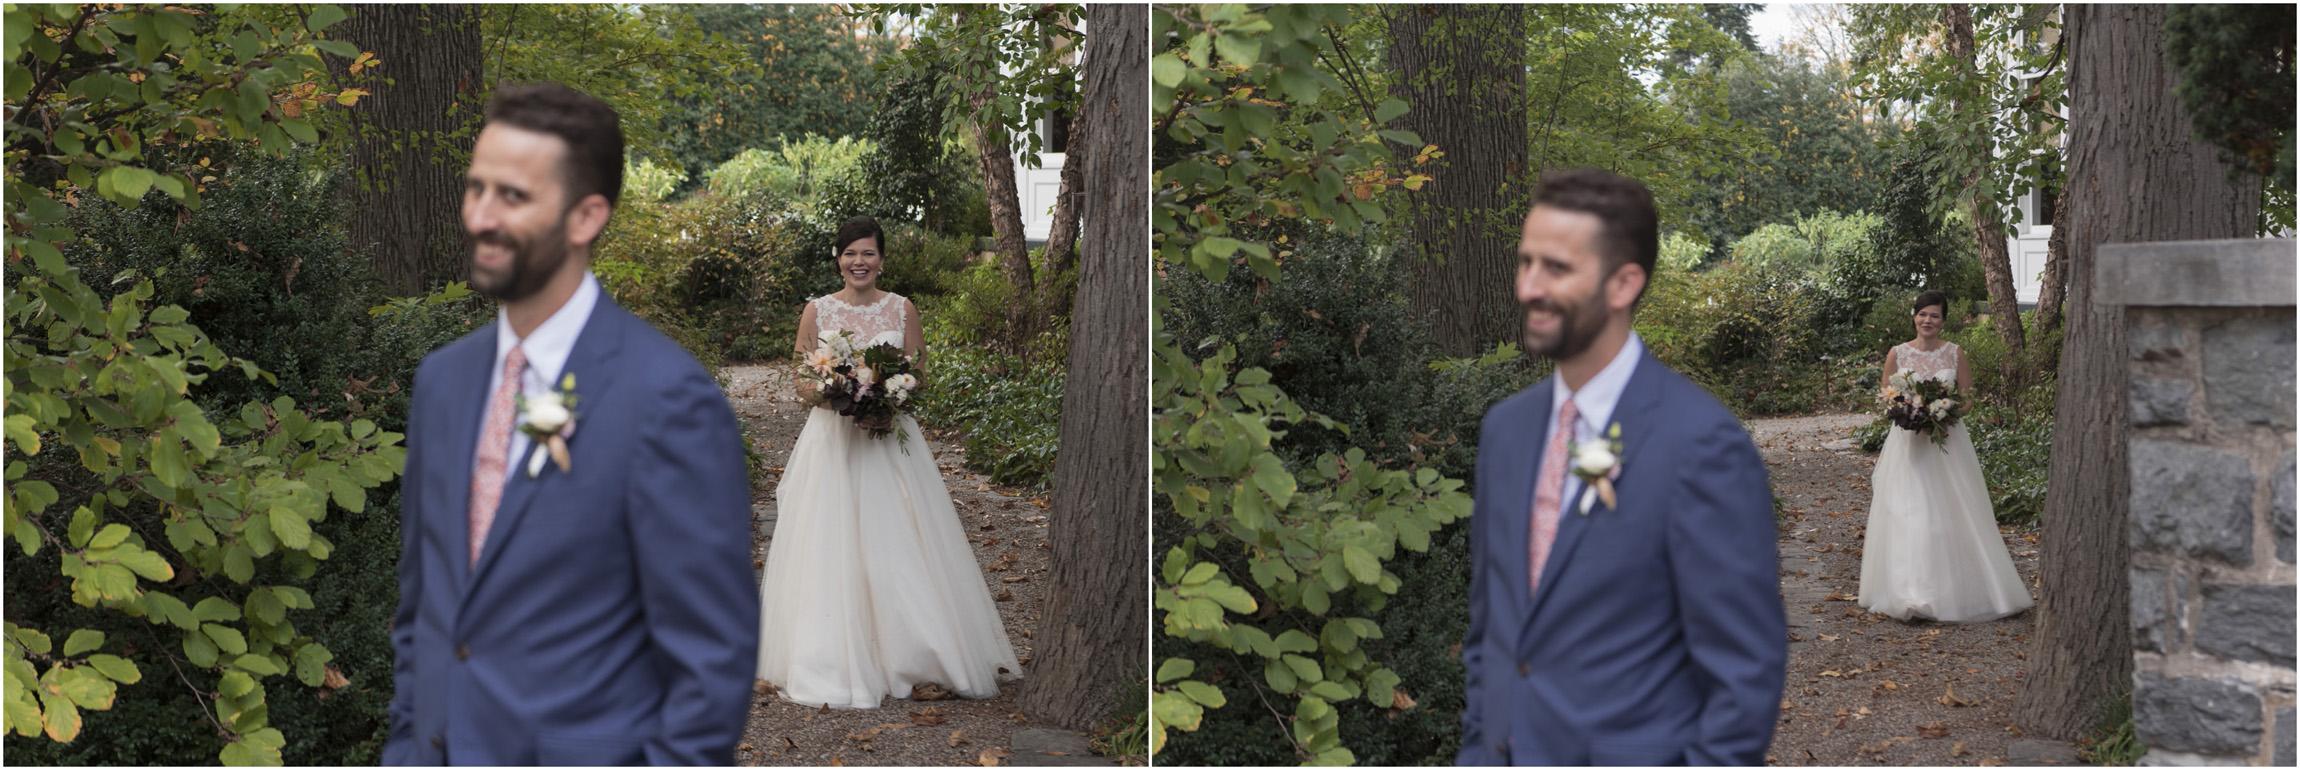 ©FianderFoto_Melissa_Mark_Wedding_Maryland_014.jpg